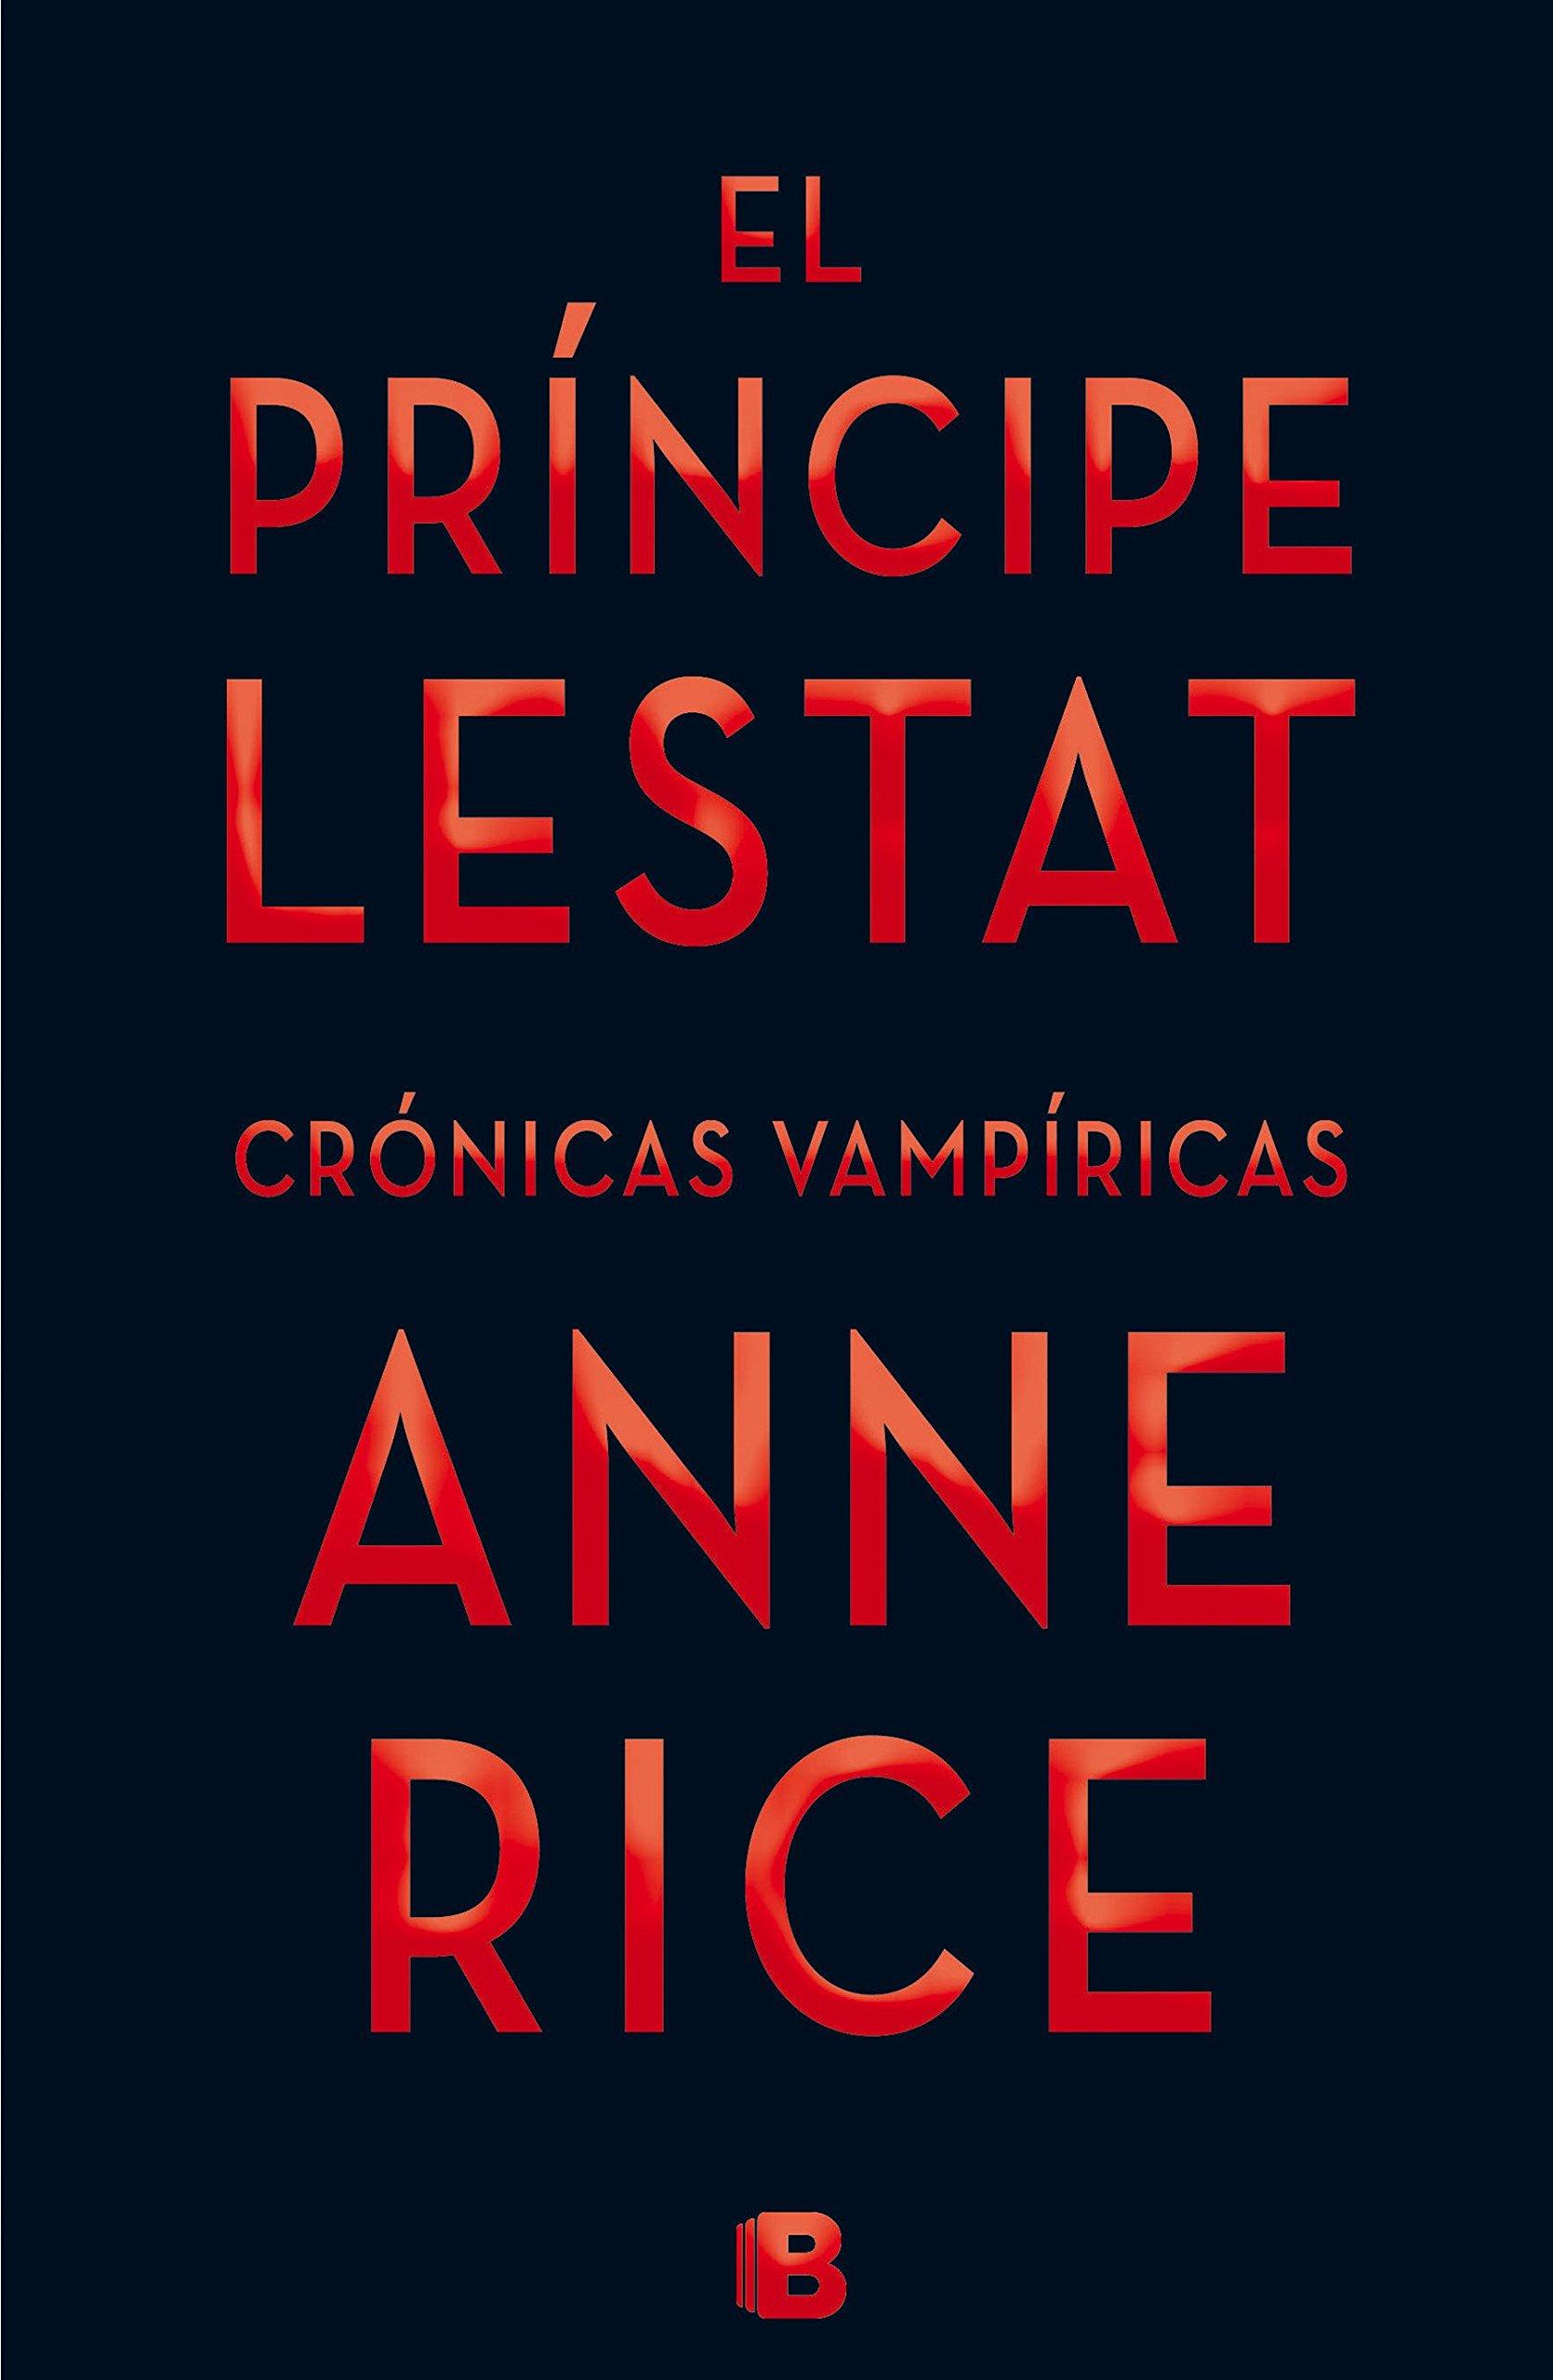 El Príncipe Lestat (Crónicas Vampíricas 11) (LA TRAMA) Tapa dura – 25 mar 2015 Anne Rice B 8466656413 Horror fiction